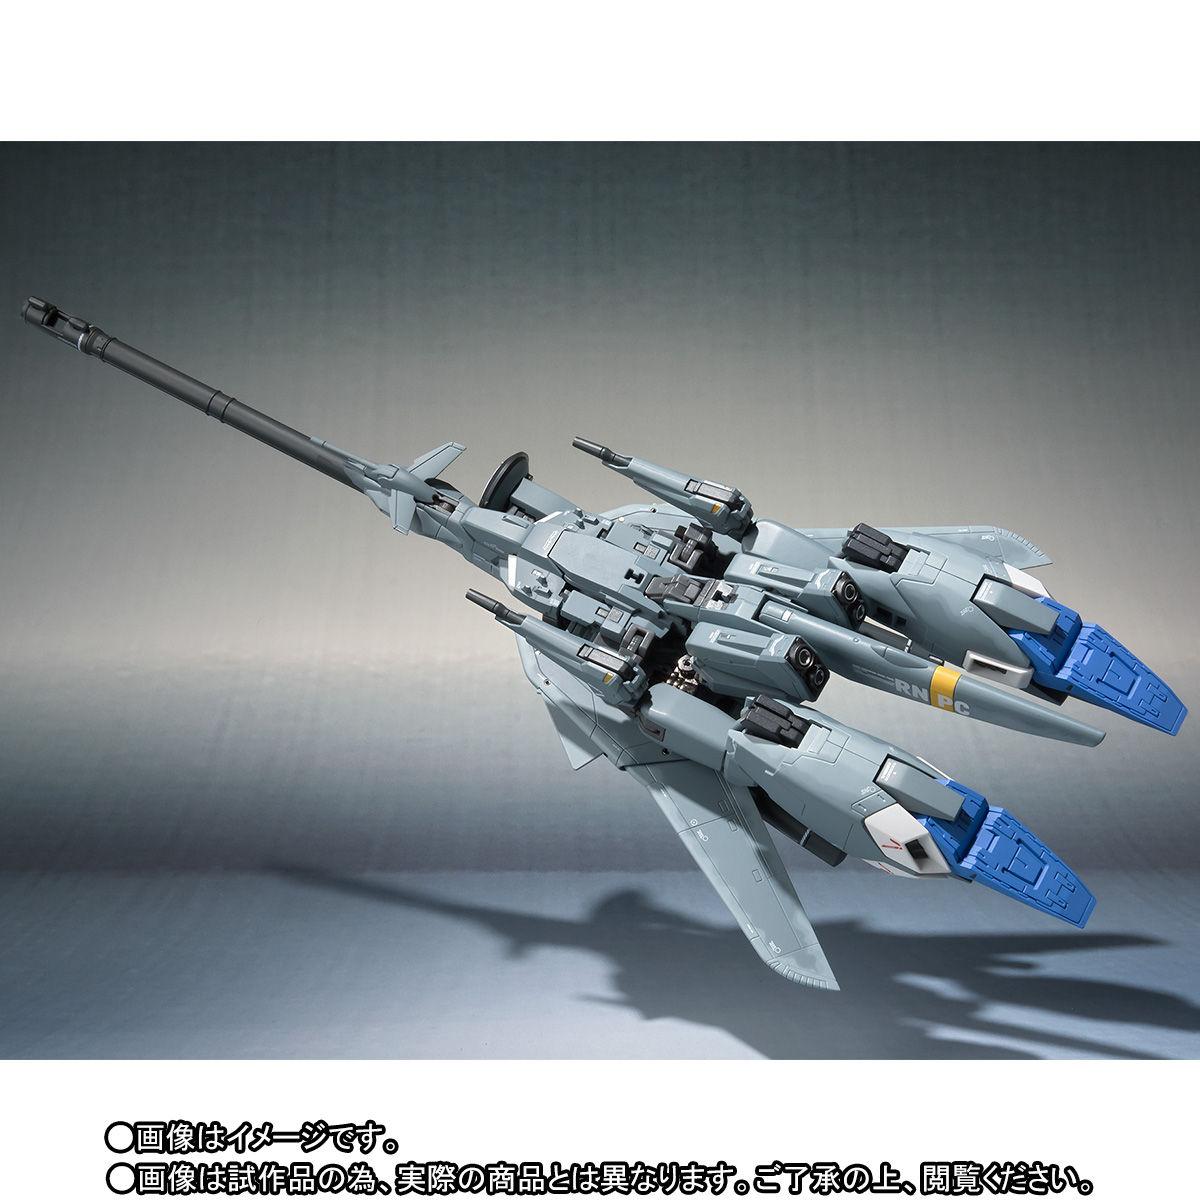 METAL ROBOT魂(Ka signature)<SIDE MS>『ゼータプラス C1(03 シグマン機)』可動フィギュア-006